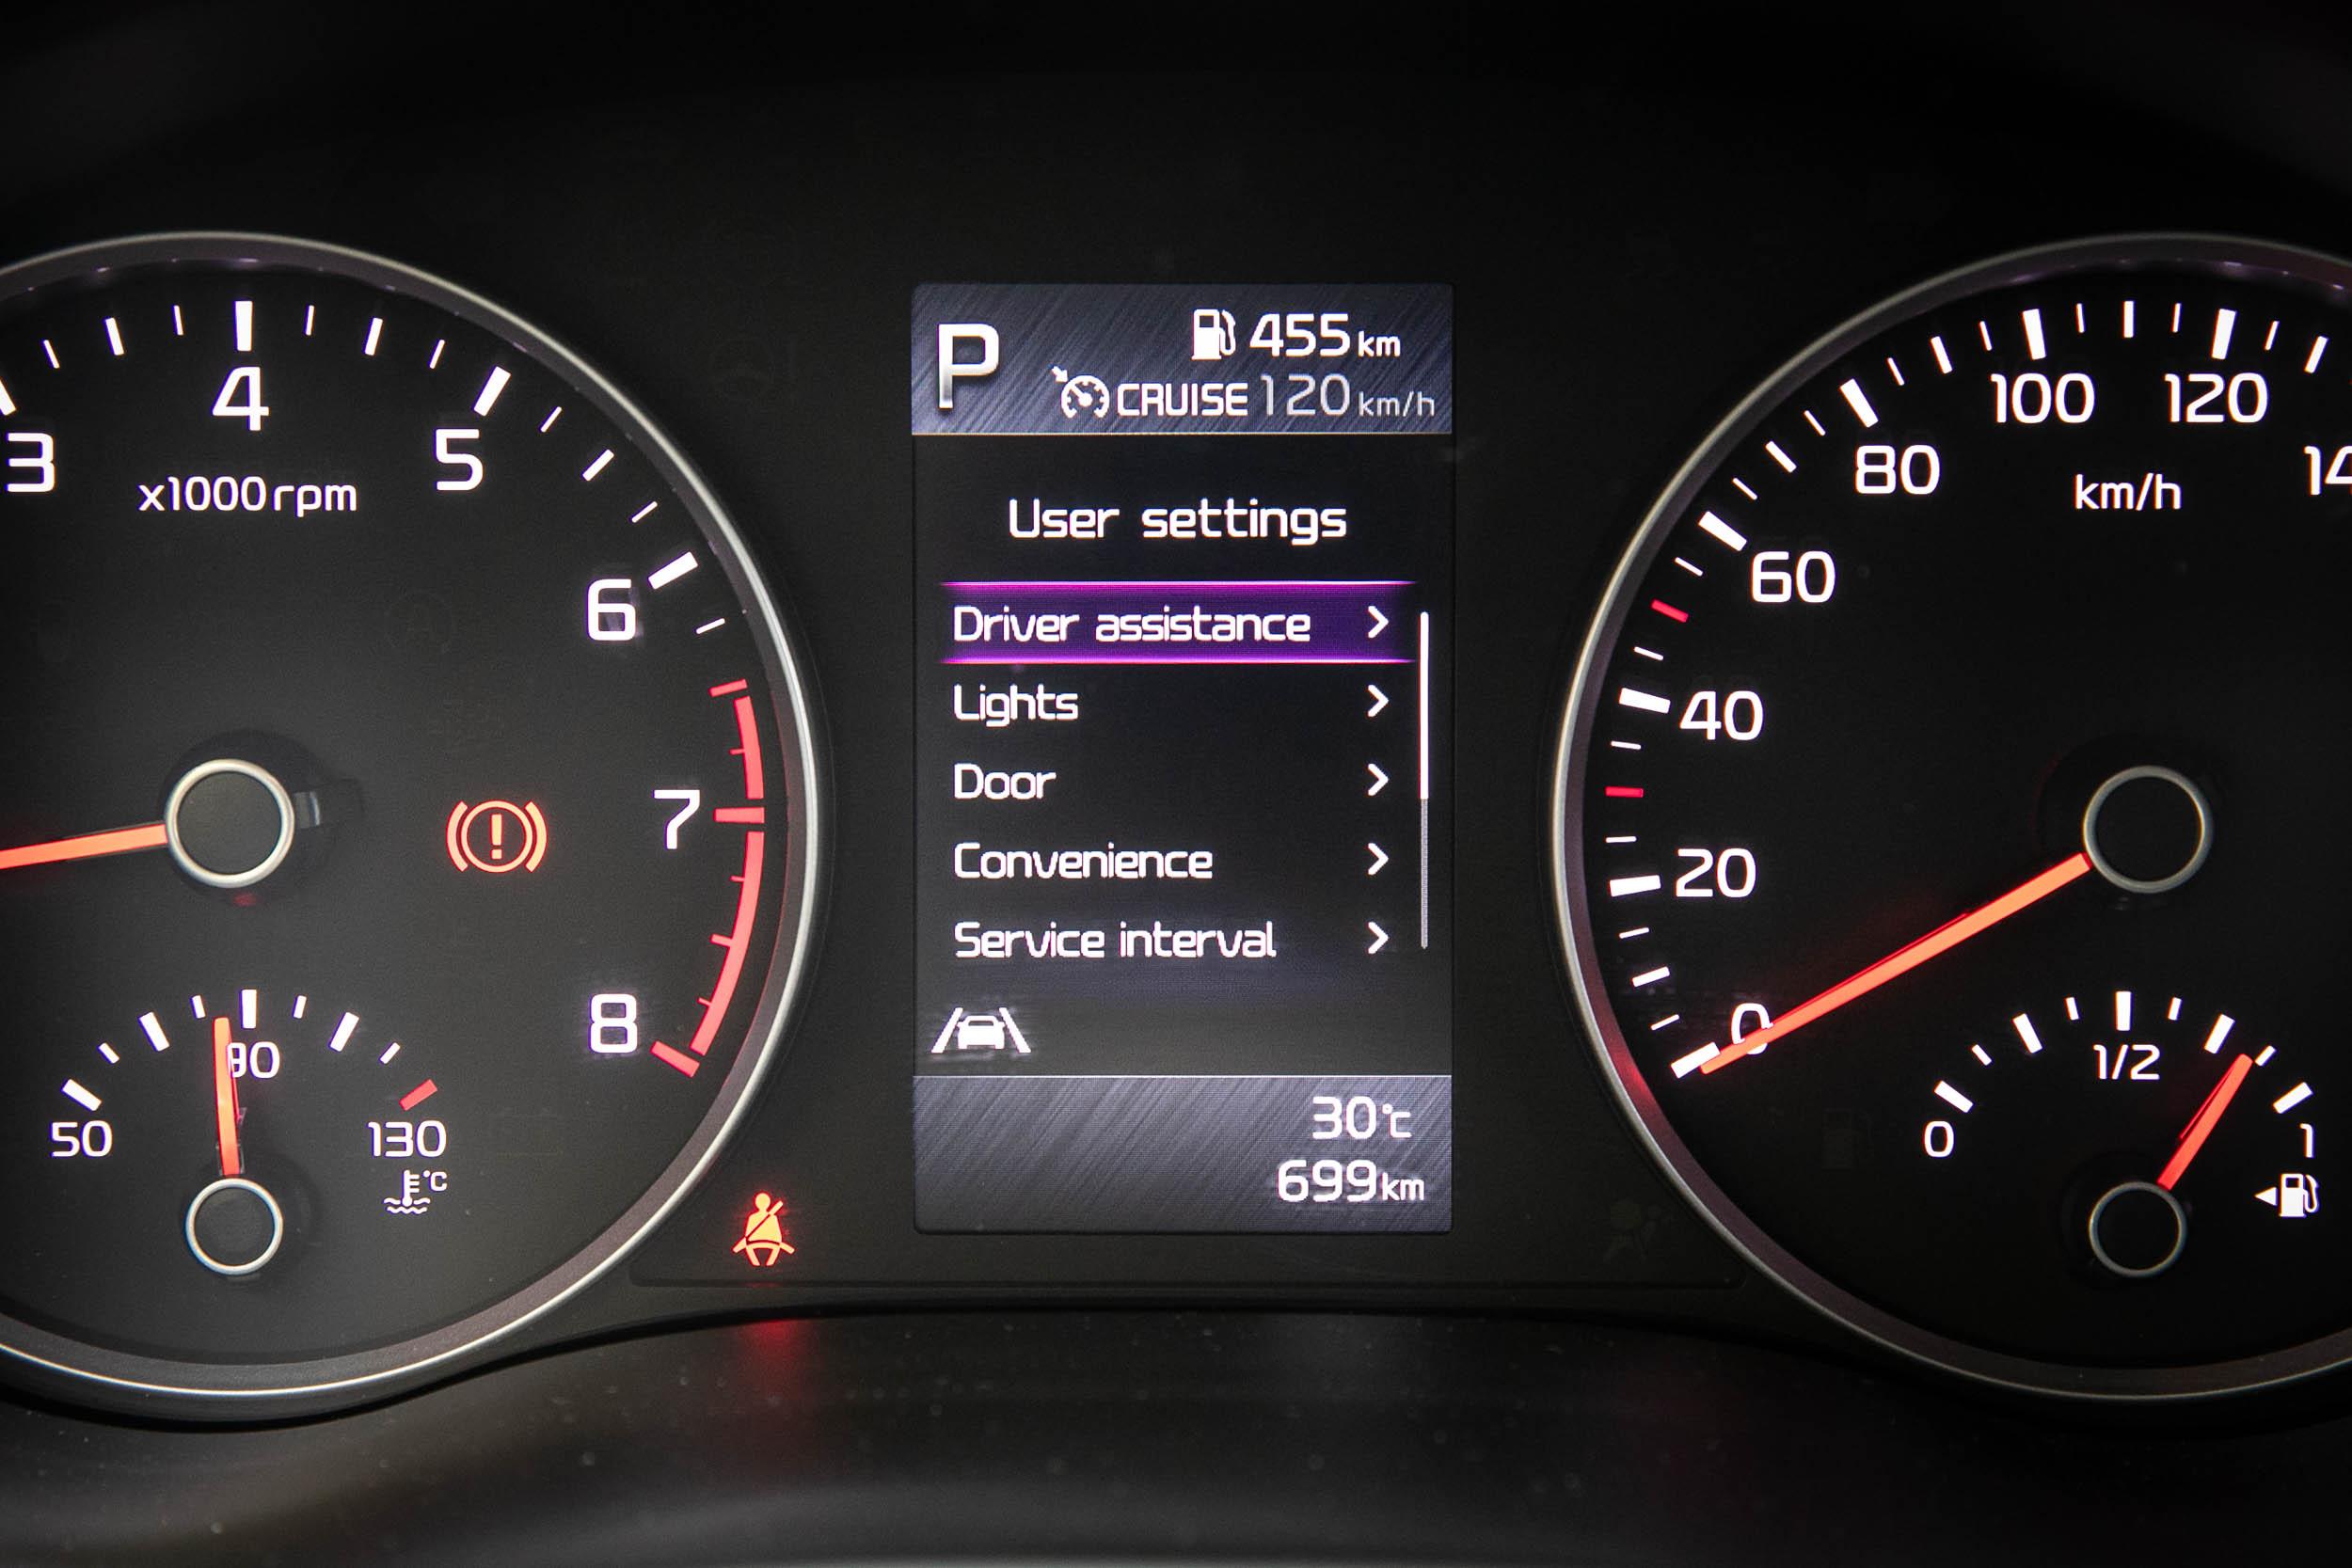 Stonic全車系標配Drive Wise智慧安全輔助系統,絕對是同級中的安全優等生。